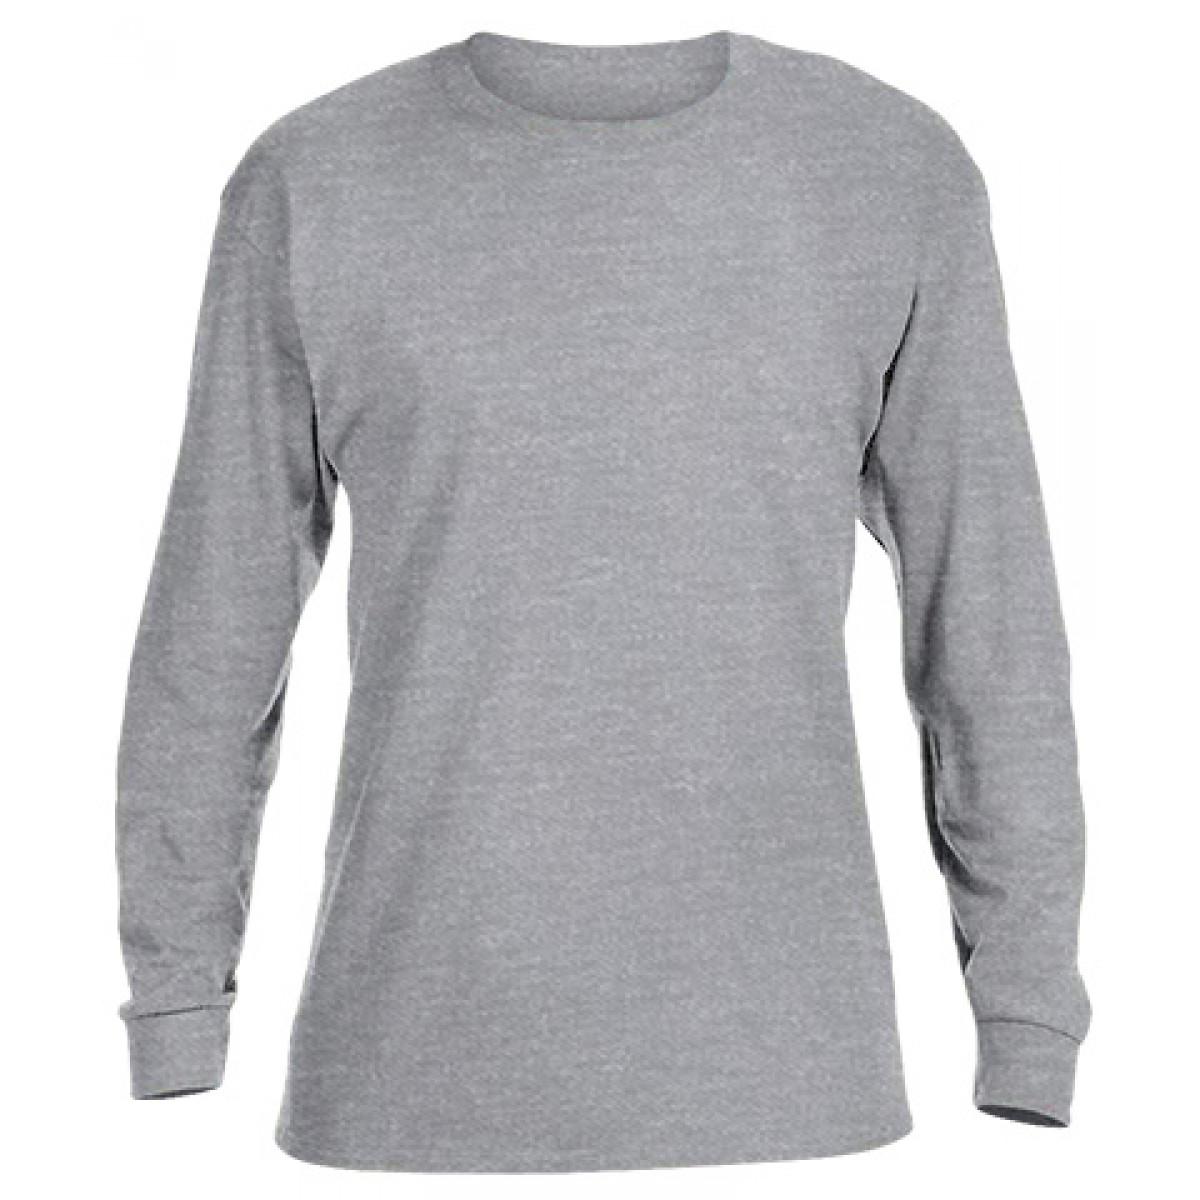 Basic Long Sleeve Crew Neck -Ash Gray-YS